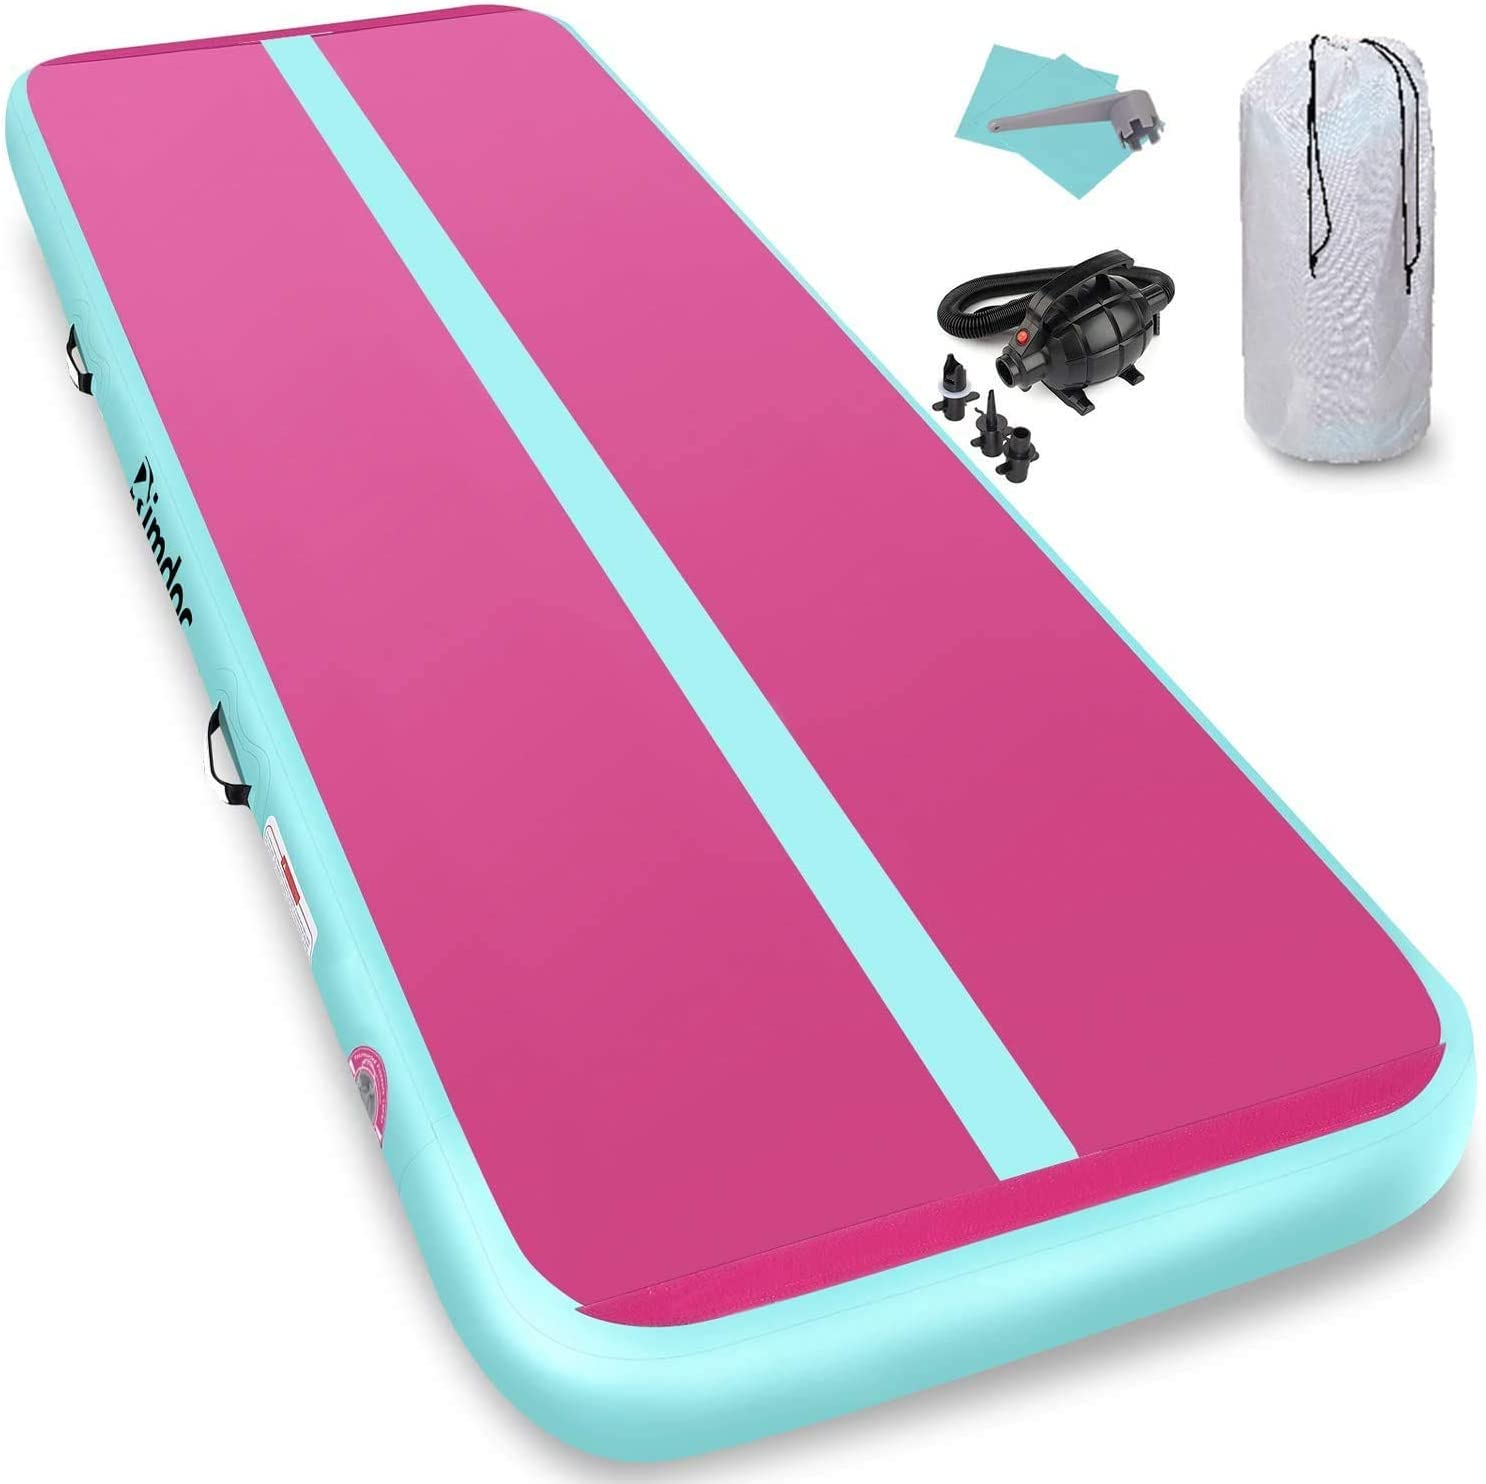 CNSPORT Airtrack Tapis de Gymnastique Gonflable Air Track pour Gymnaste Tumbling Yoga